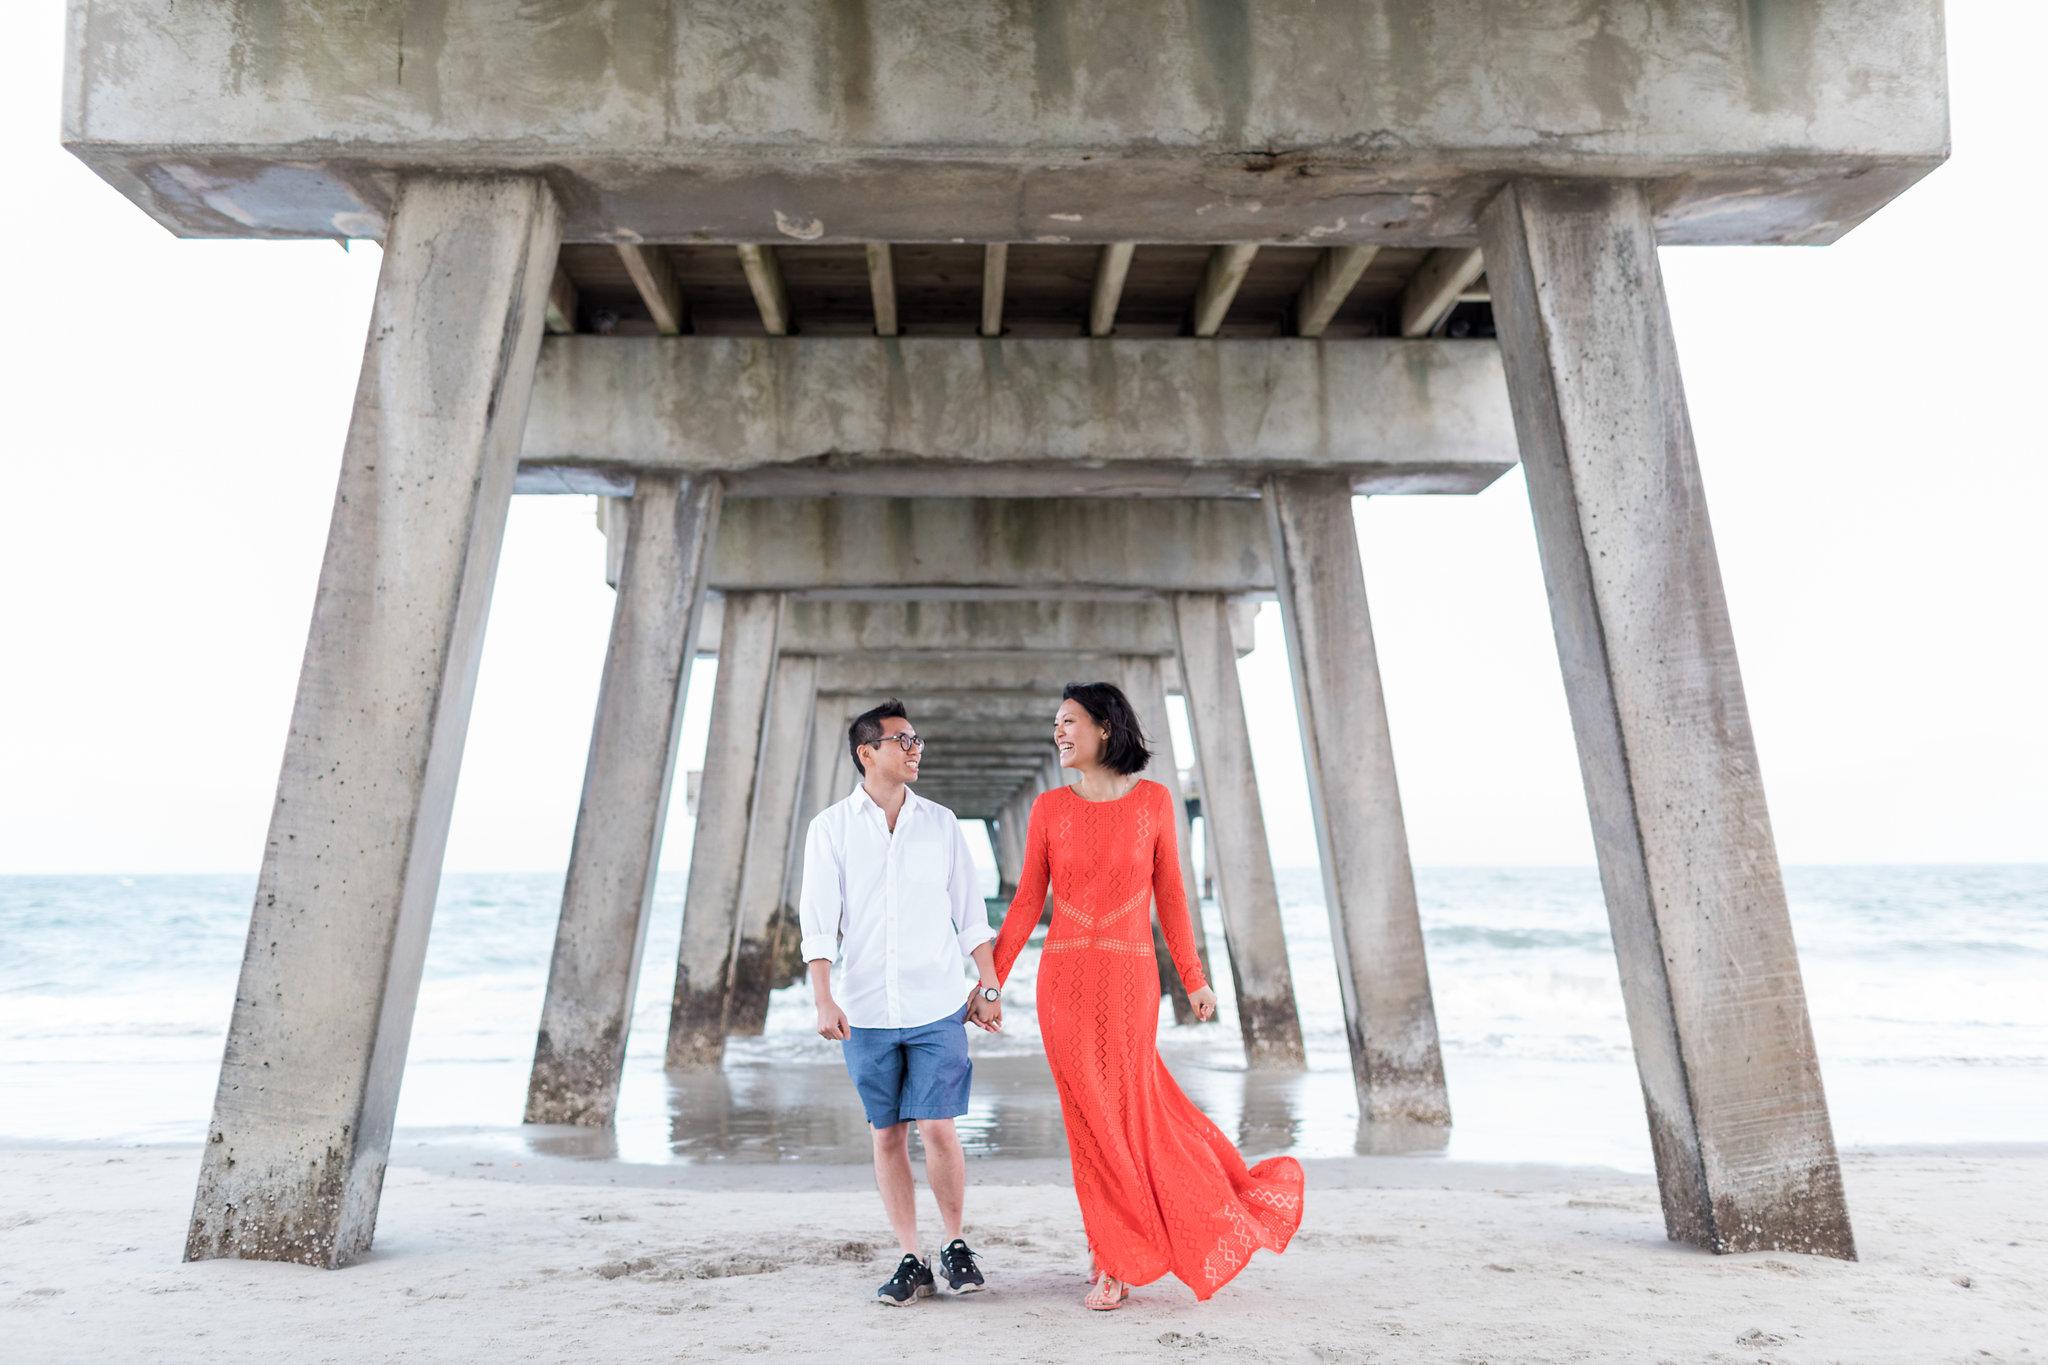 Suzanne + Gordon - Tybee Island and Savannah Engagement | Apt. B Photography